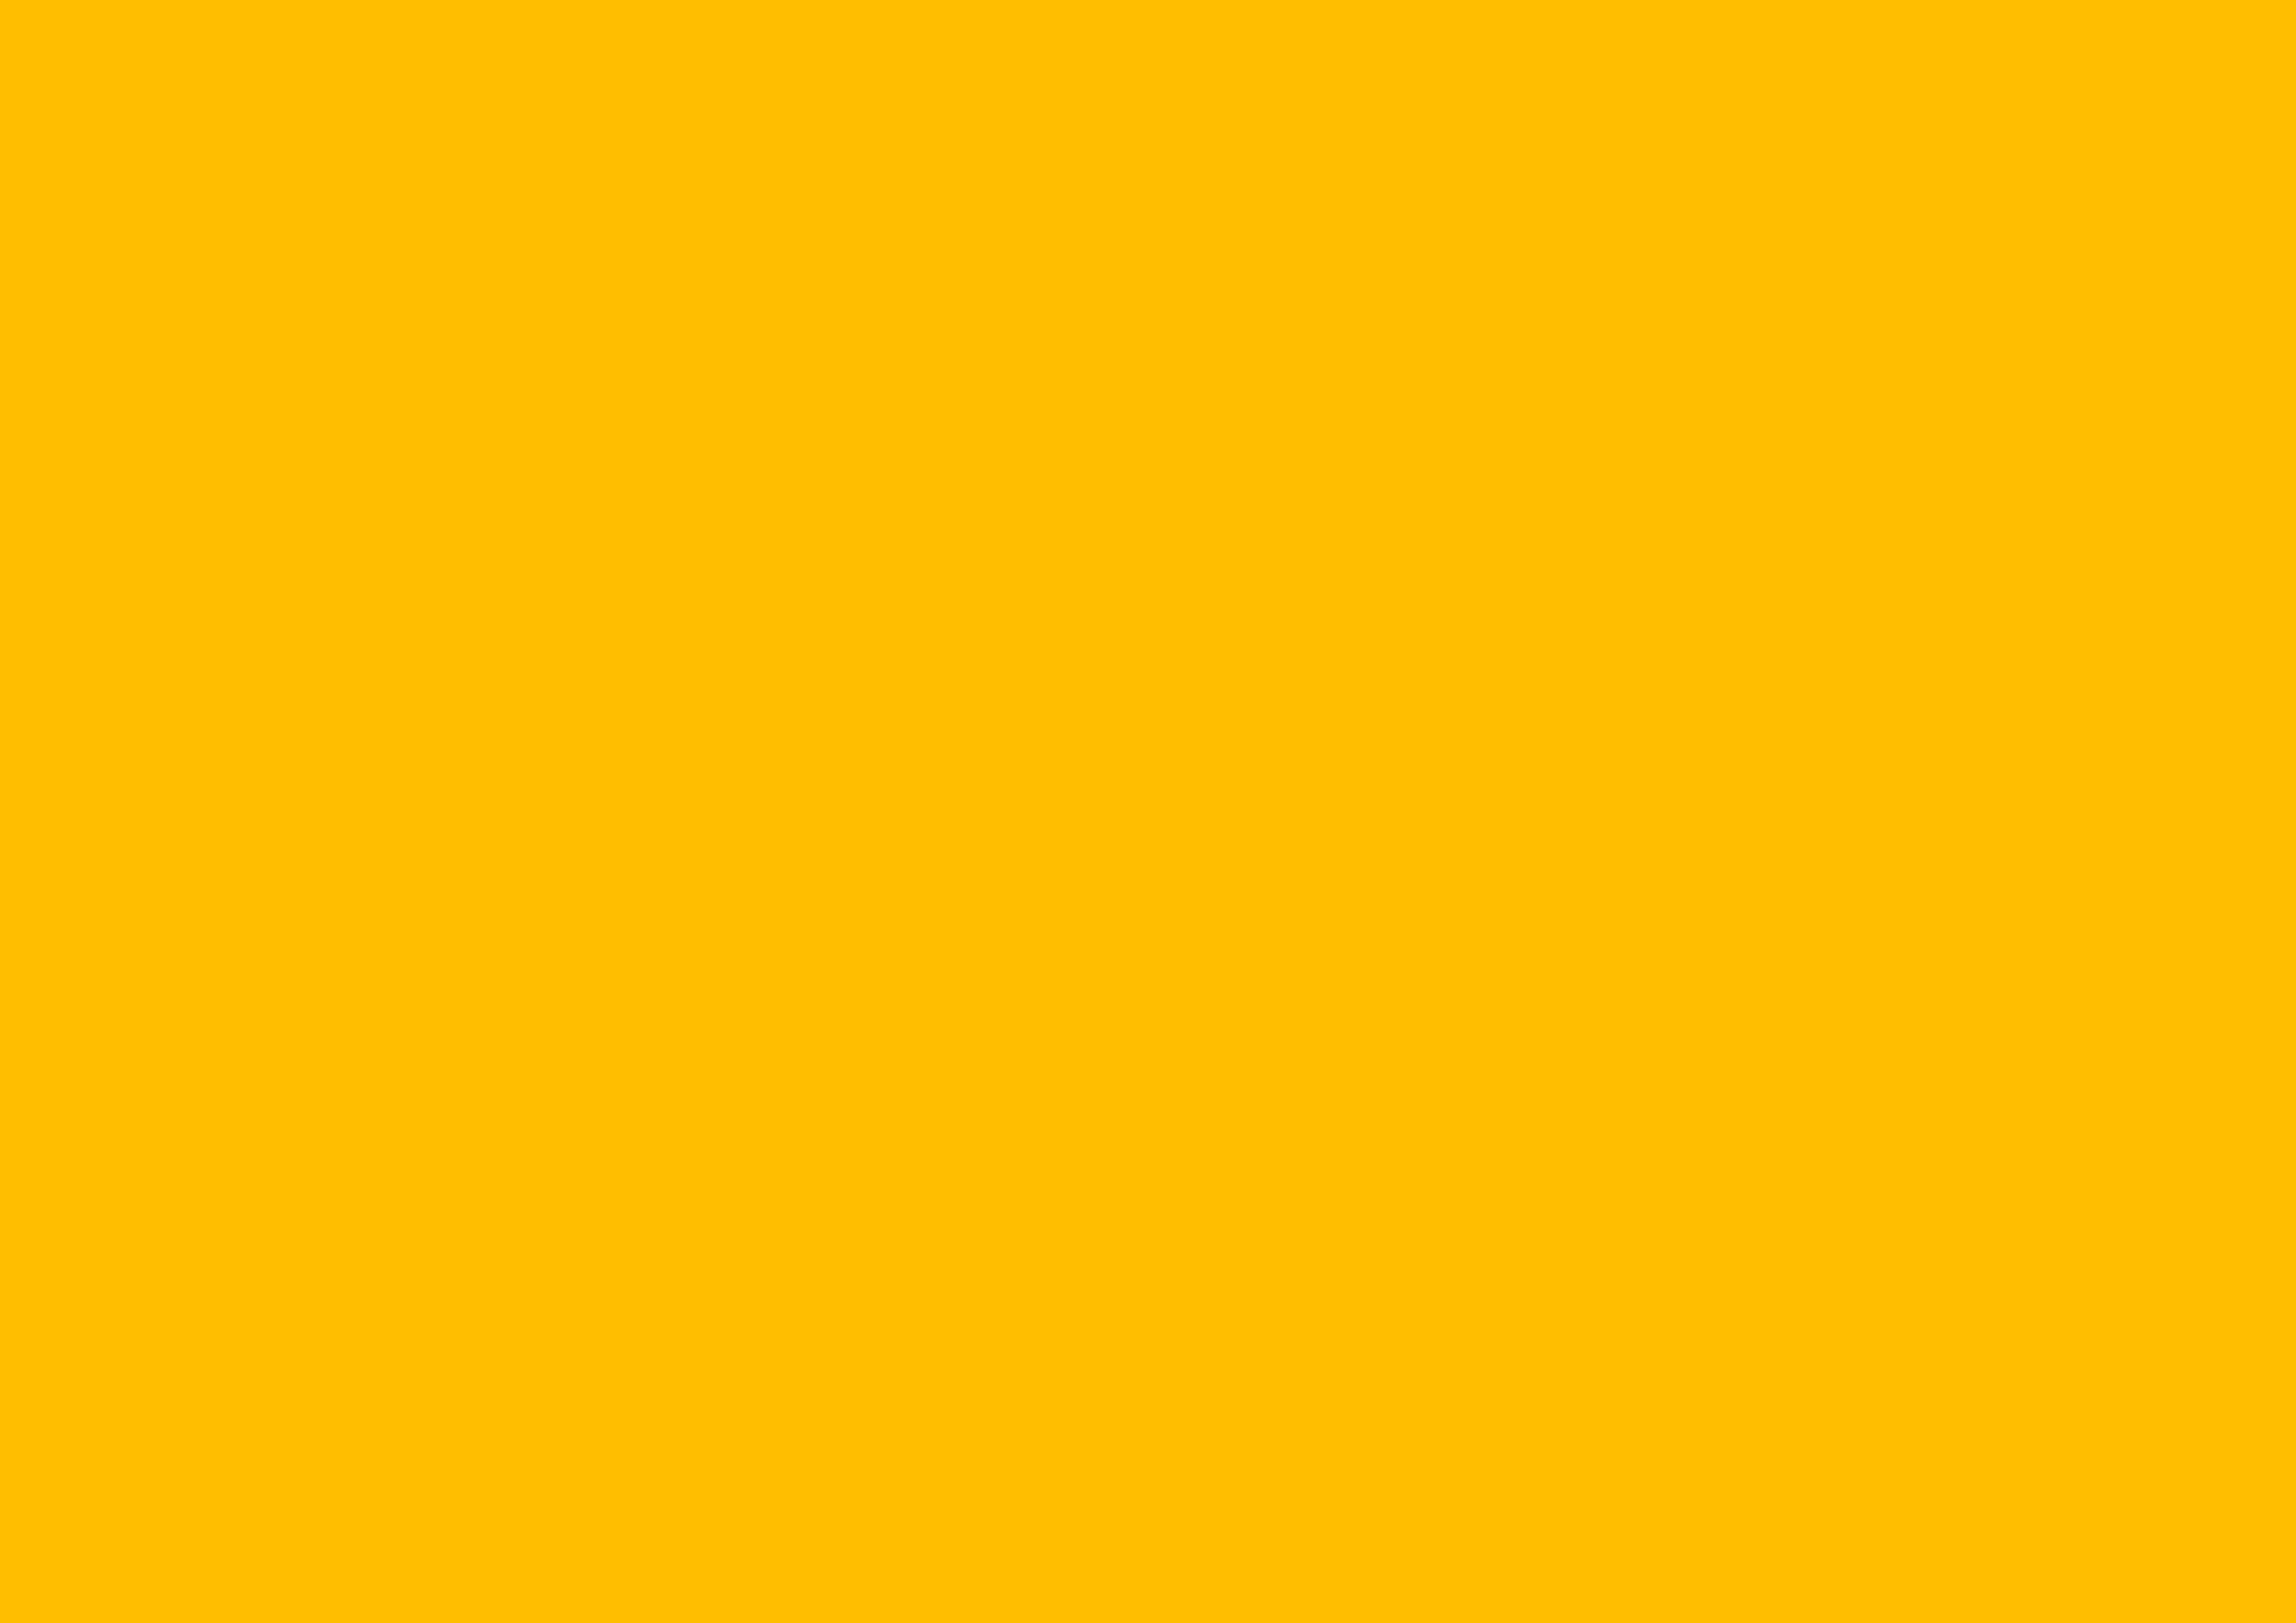 3508x2480 Fluorescent Orange Solid Color Background